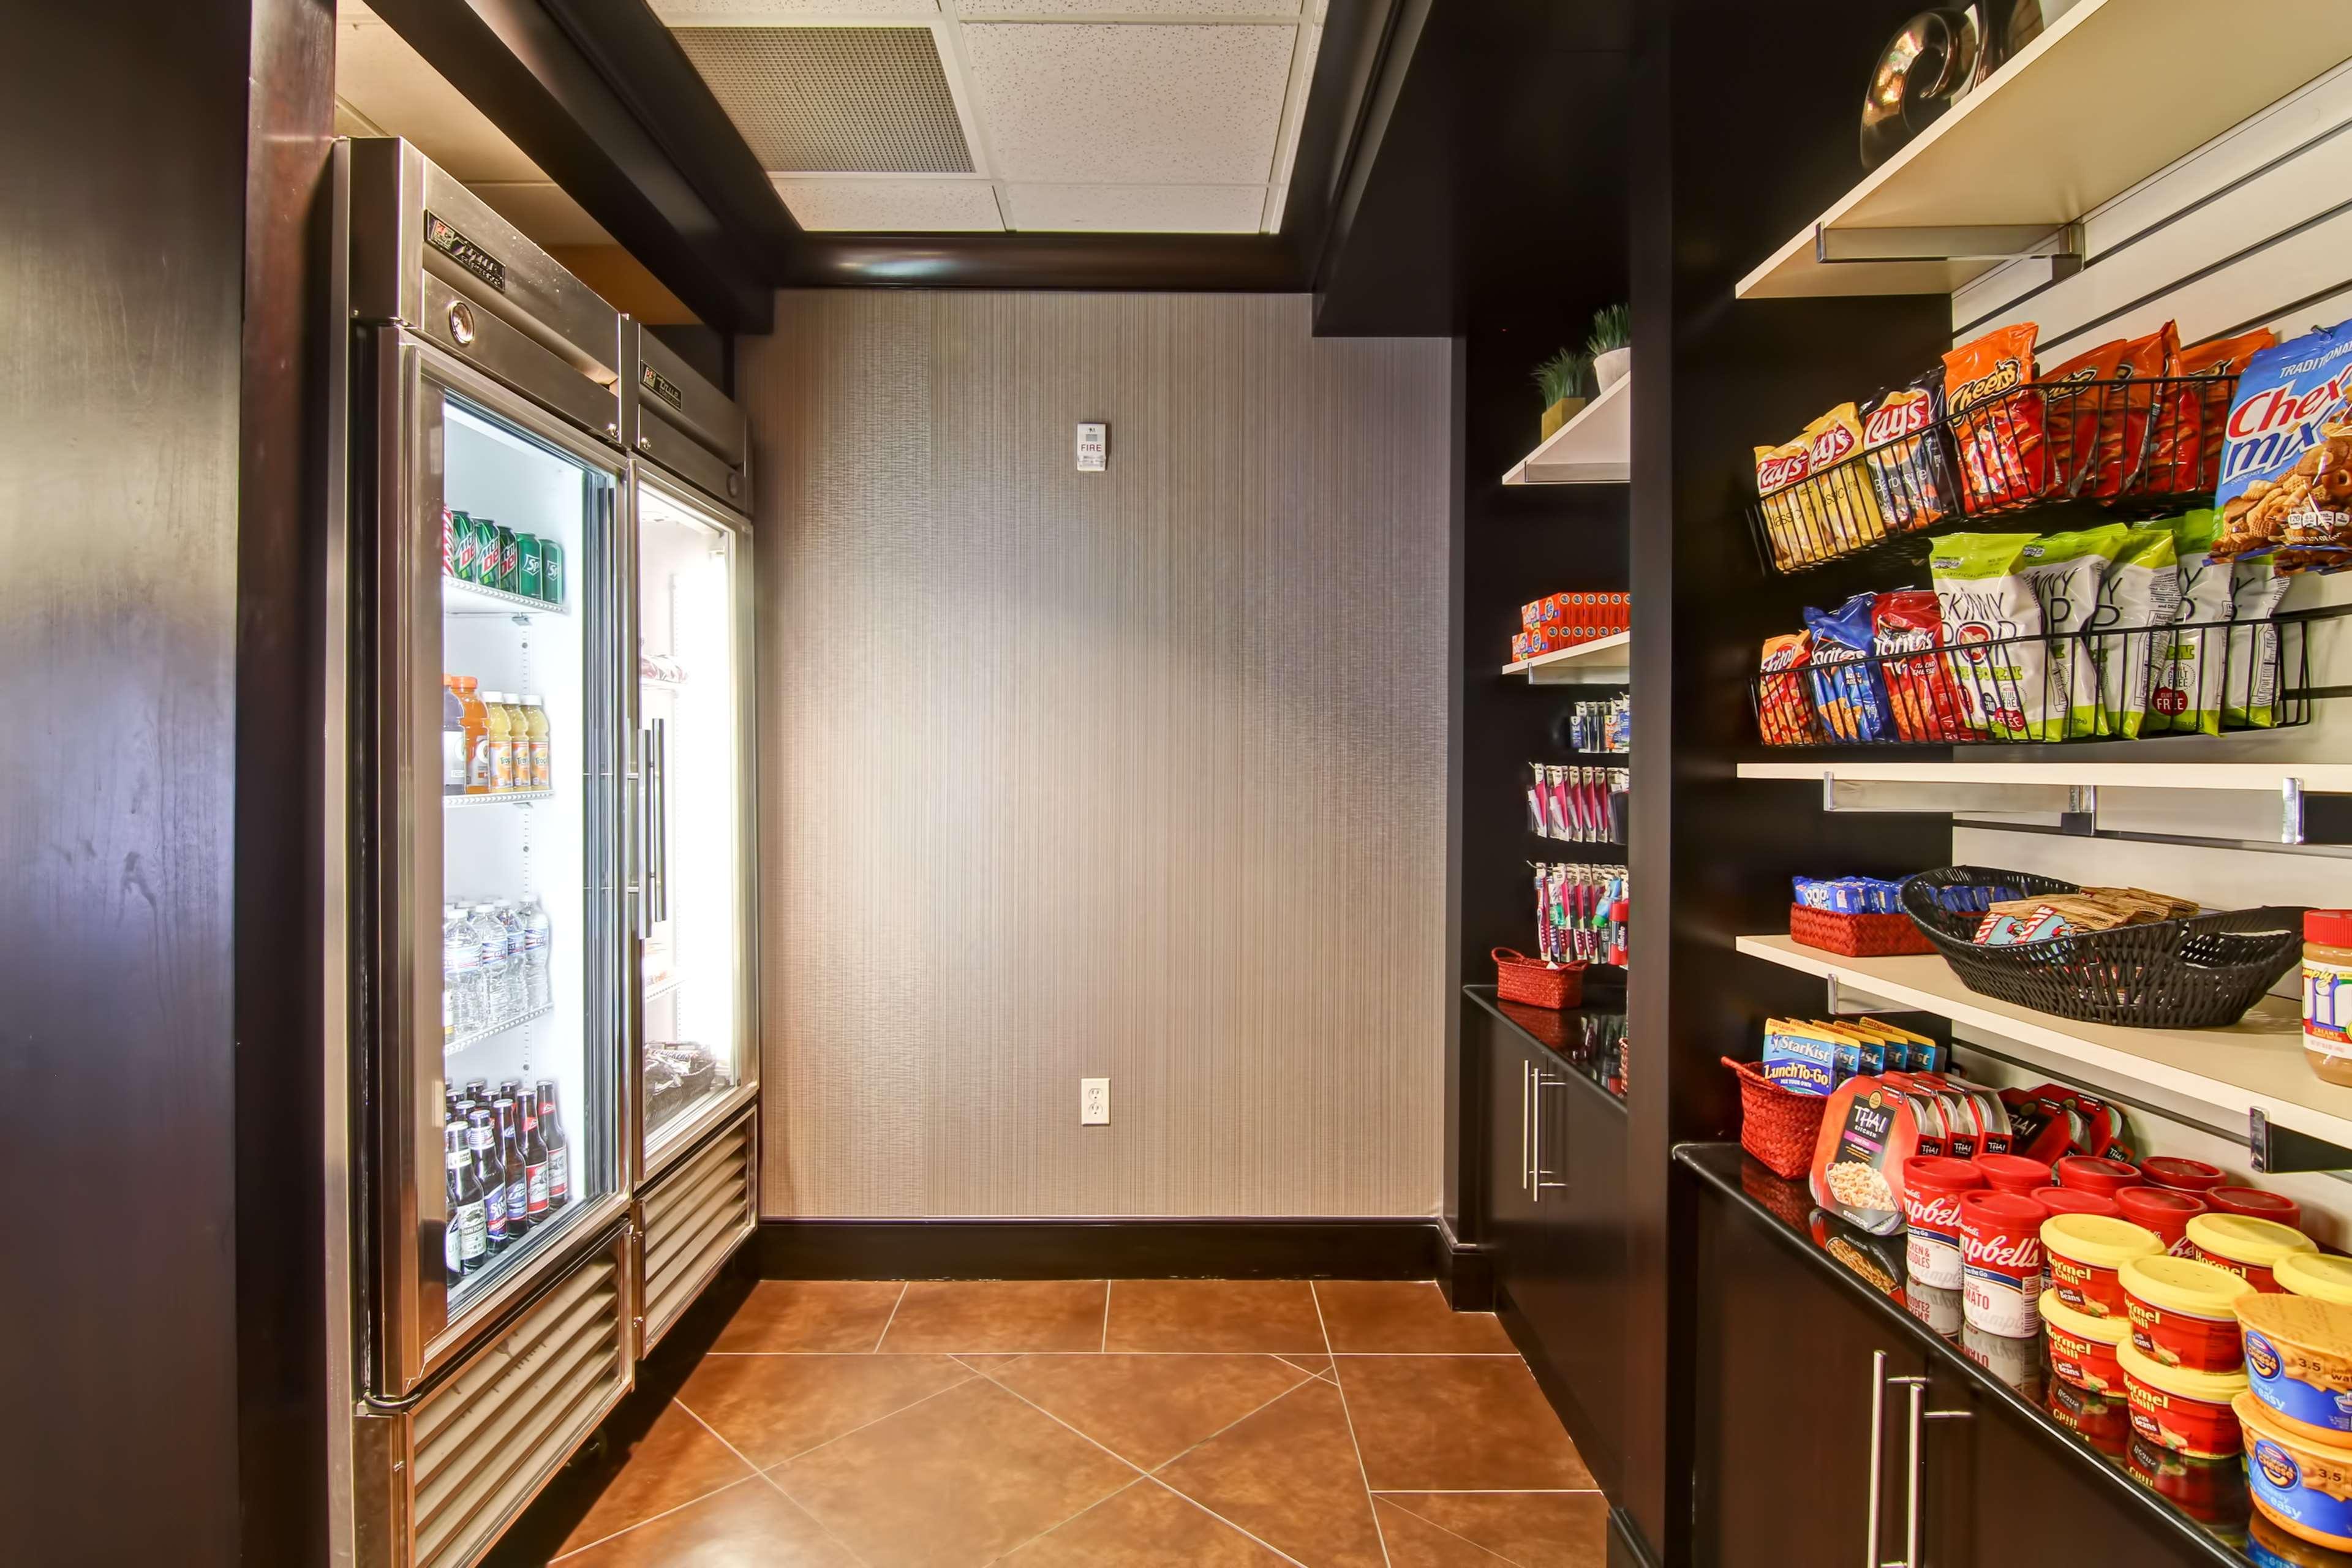 Homewood Suites by Hilton Cincinnati Airport South-Florence image 9